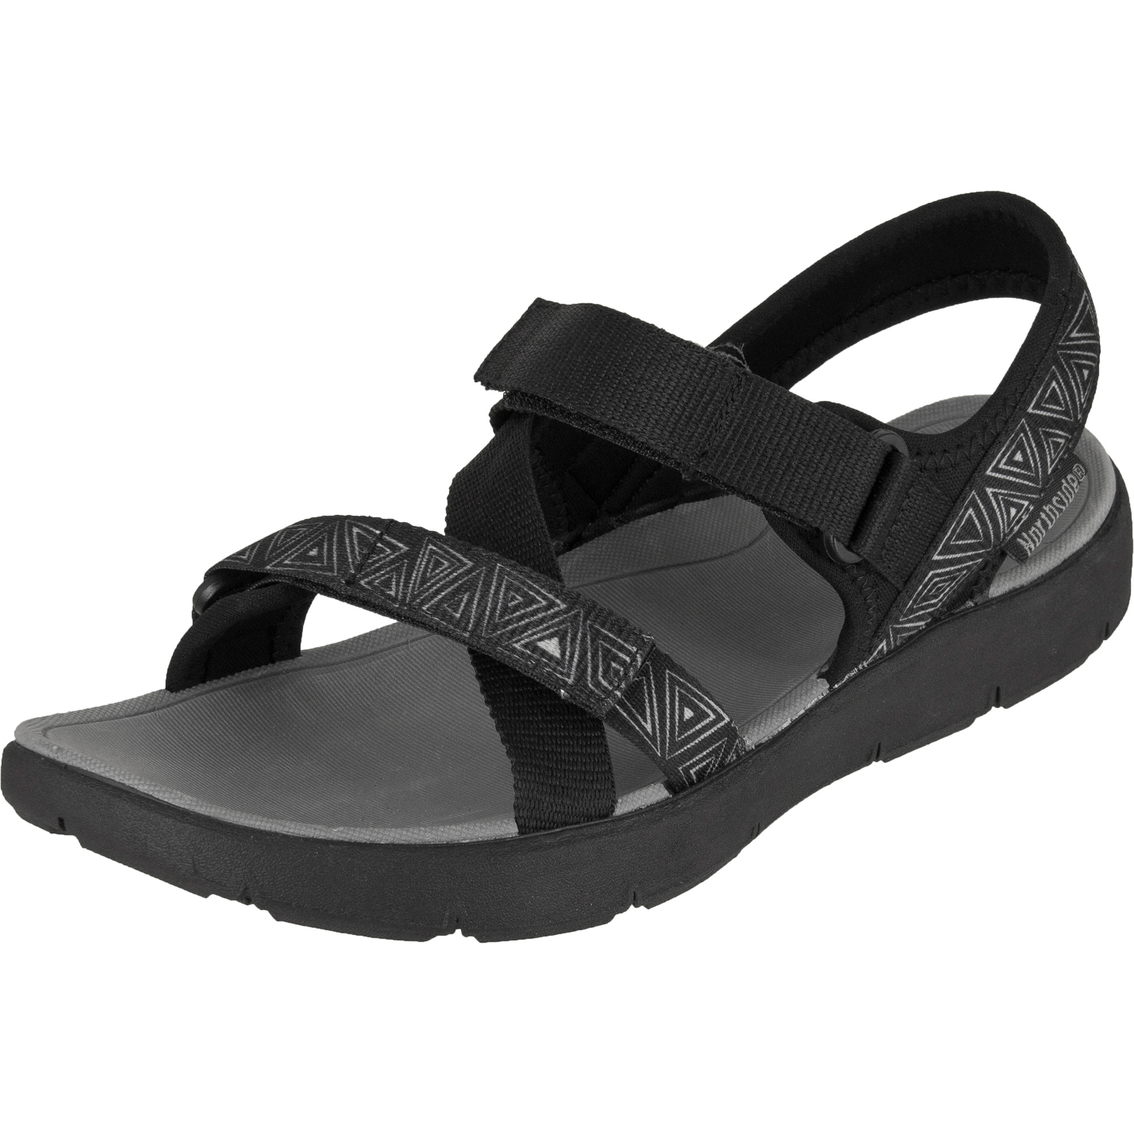 Northside Kenya Ii Sport Open Toe Strap Sandals | Flats ...